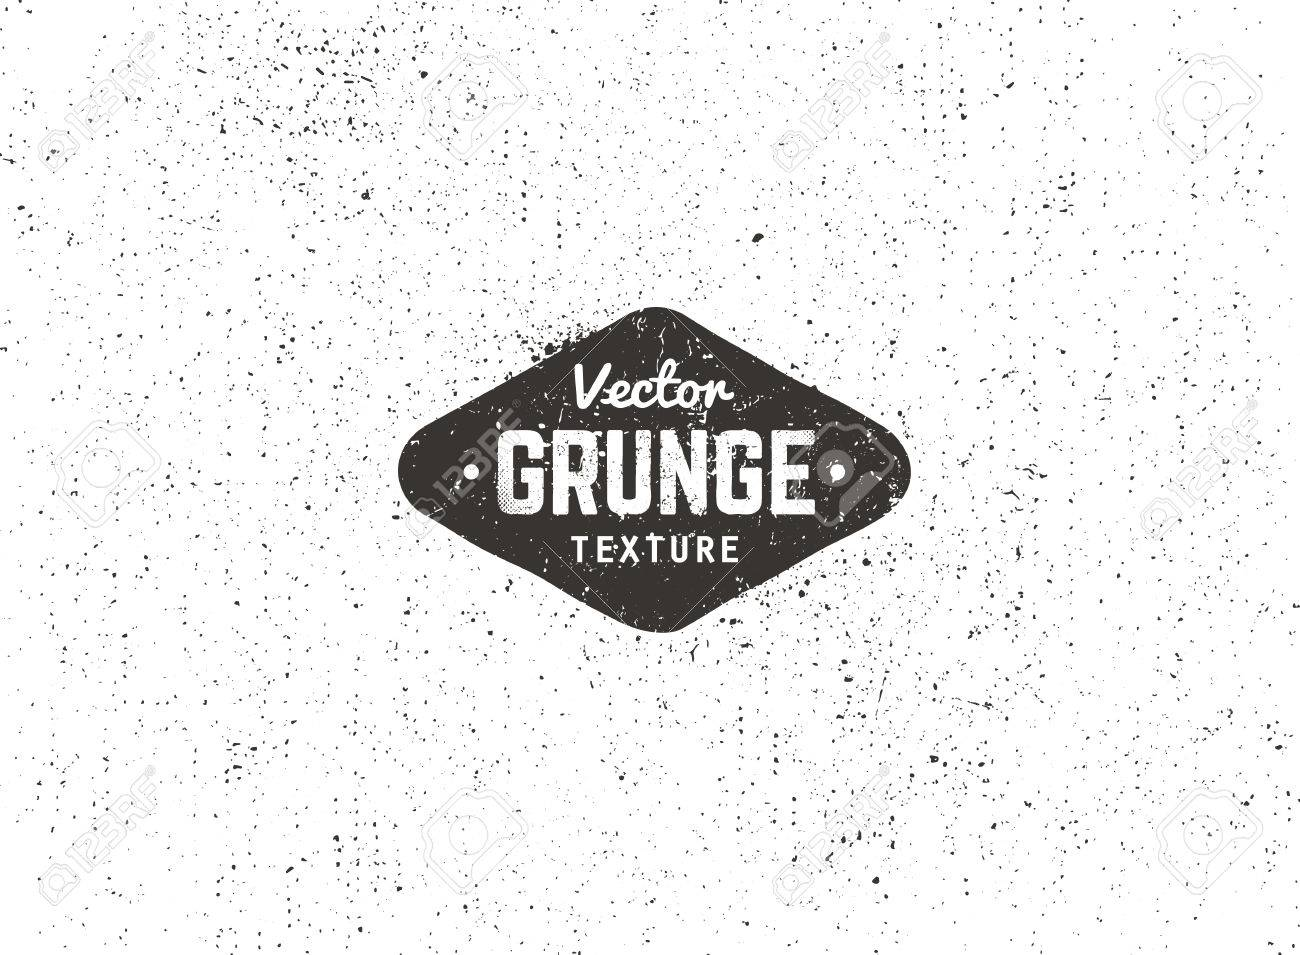 Grunge background texture. Grain noise distressed texture. - 60619263